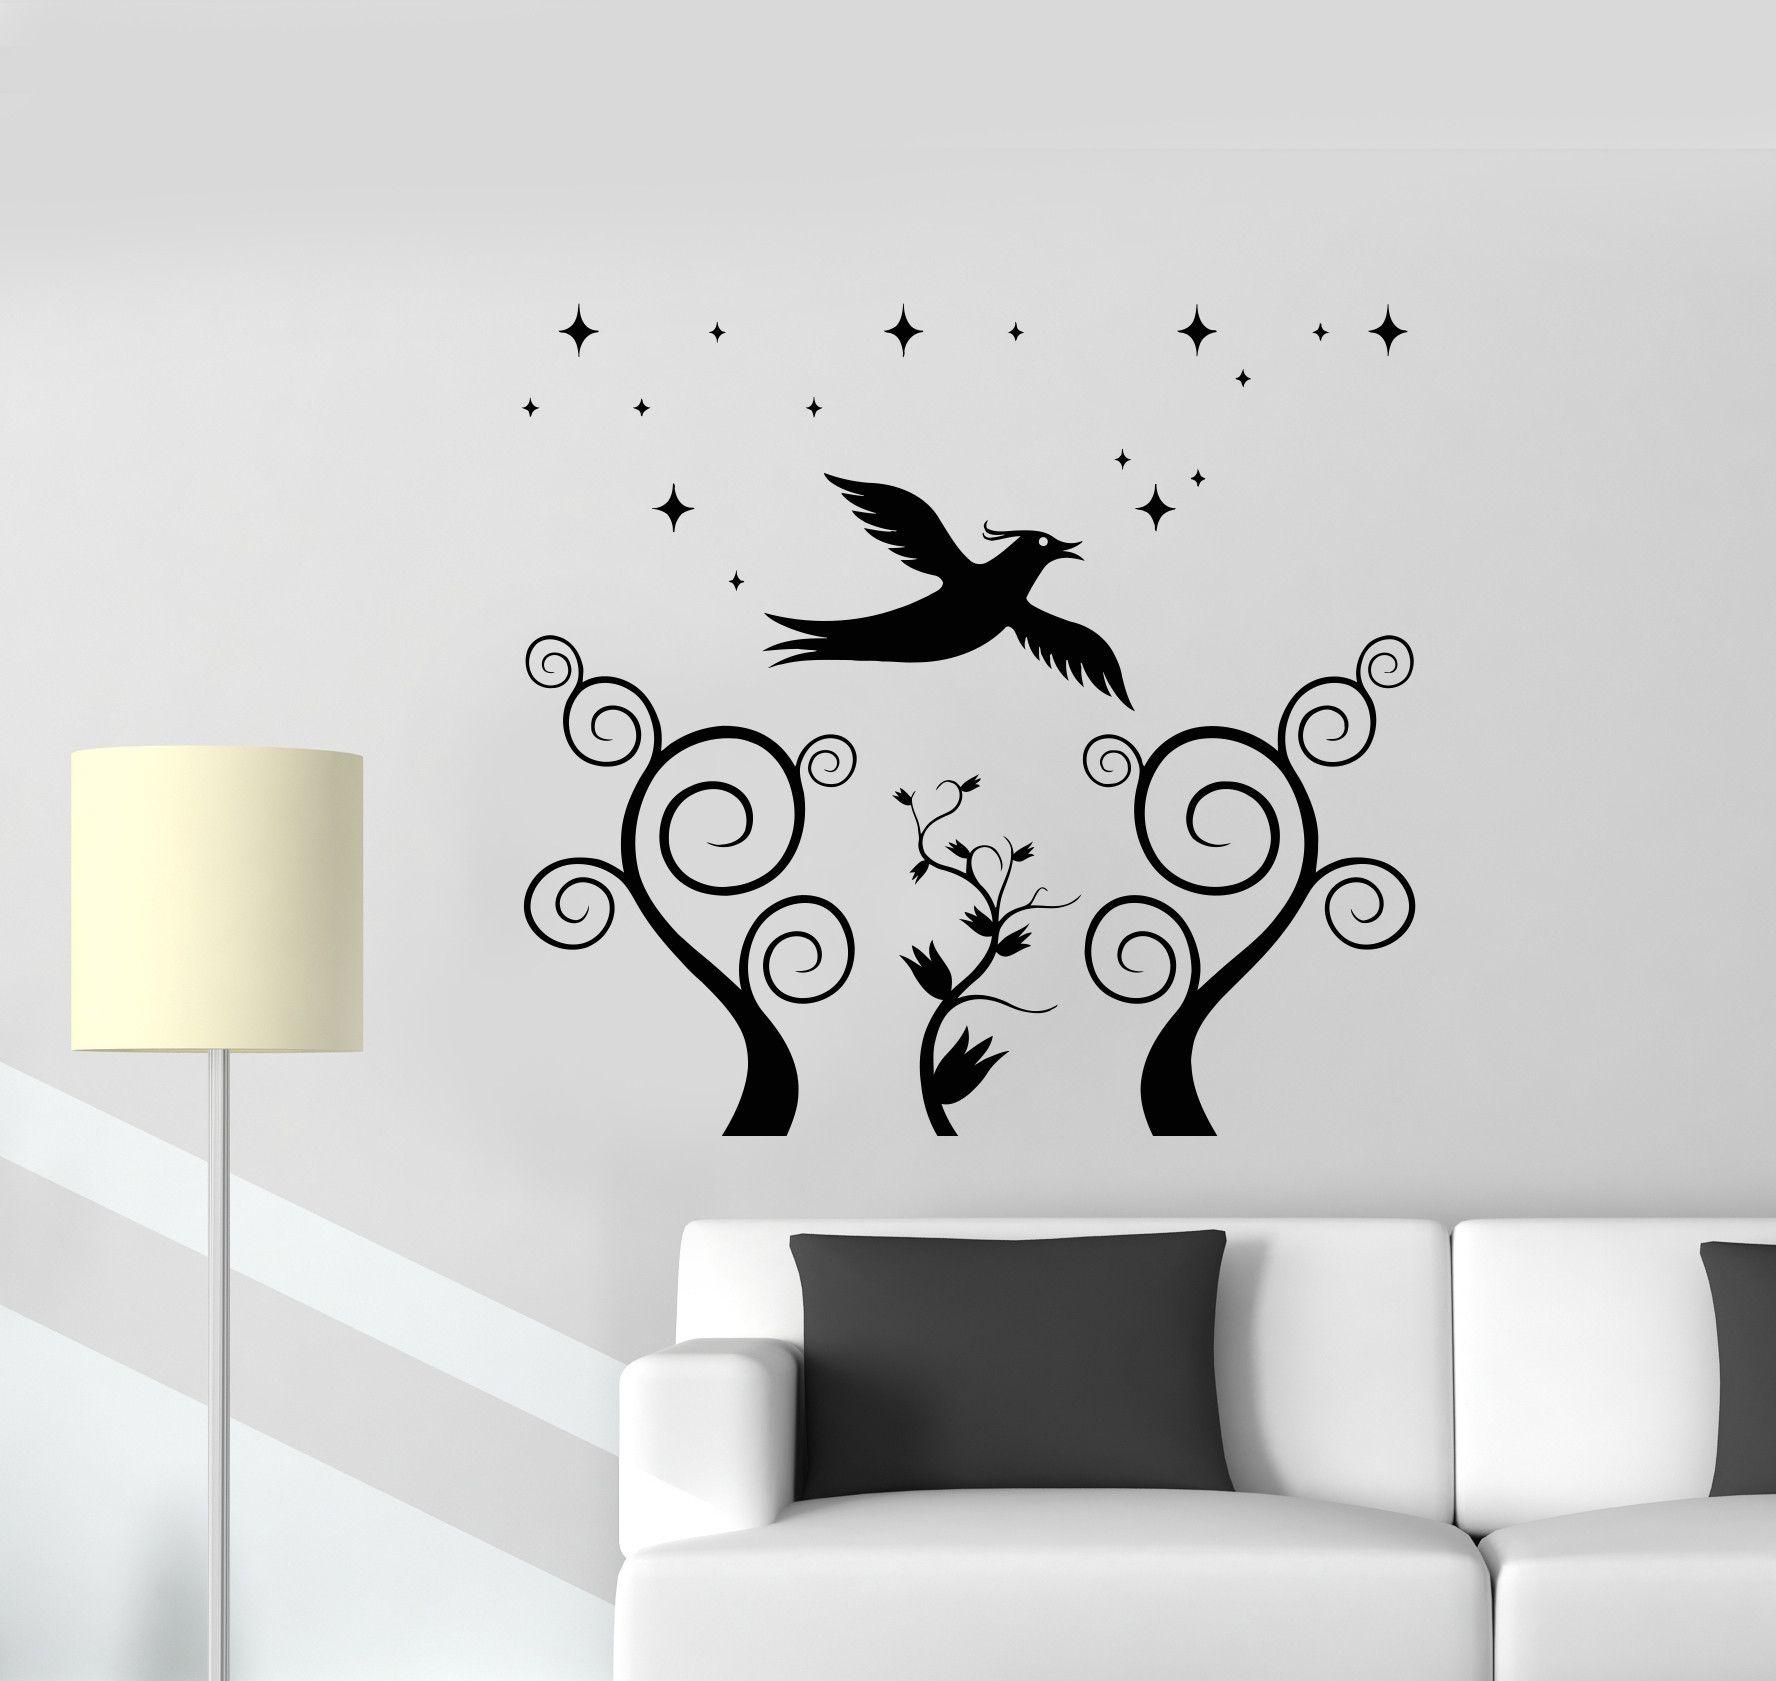 Vinyl Decal Bird Floral Decor Nursery Kids Room Wall Sticker Mural (ig2781)